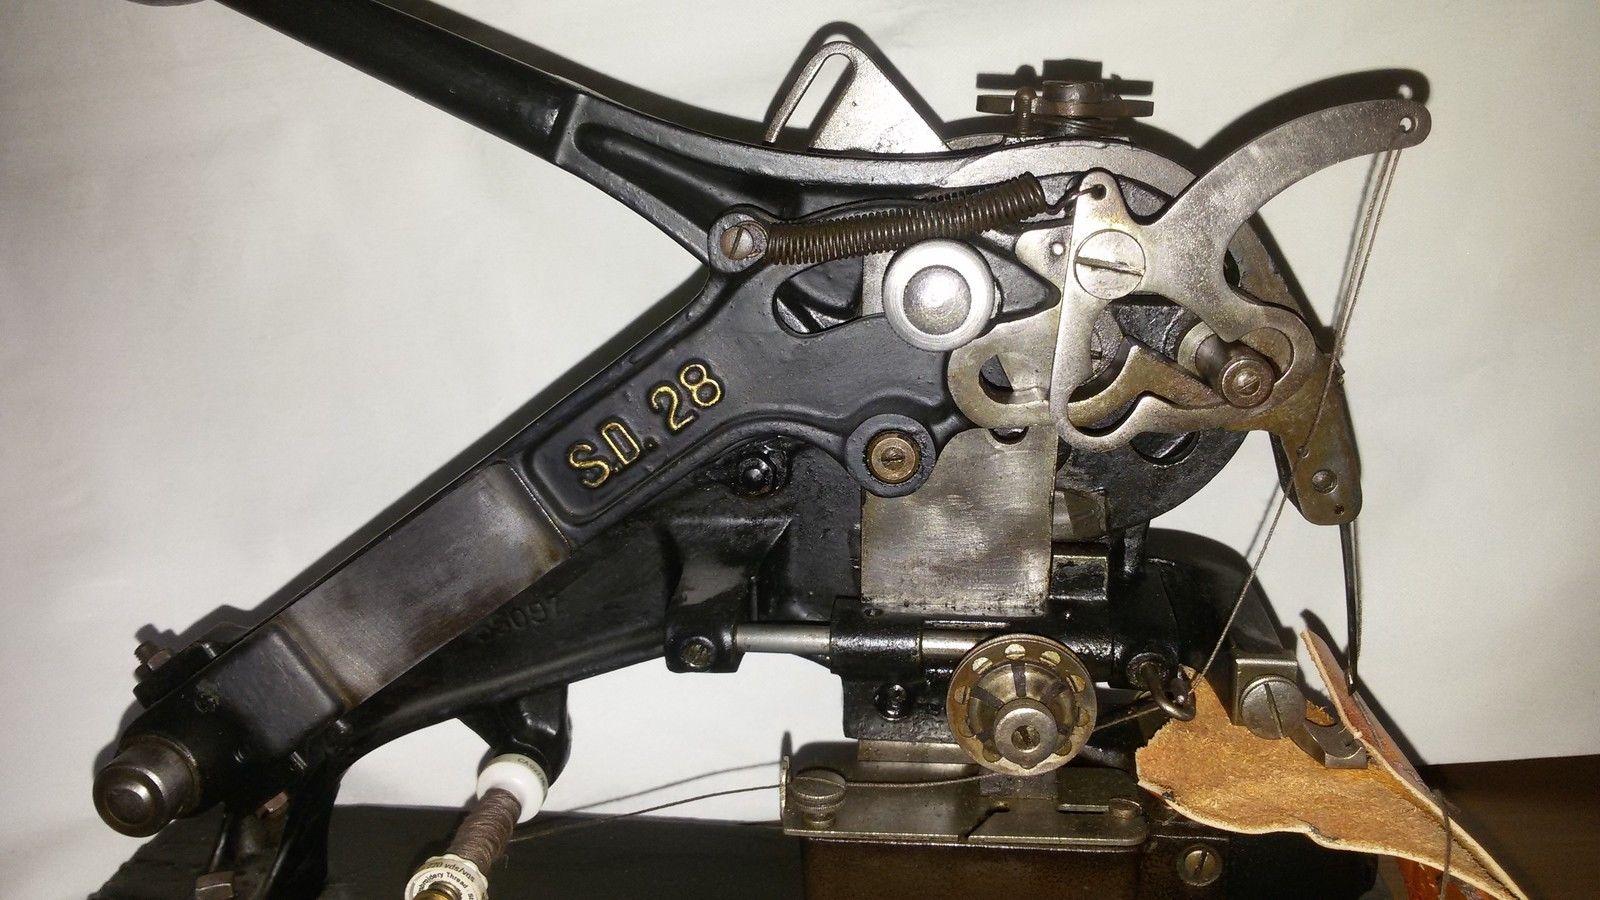 Junker & Ruh Sd 28 For Sale 1876 Museums Object  -> Nähmaschine Junker Und Ruh